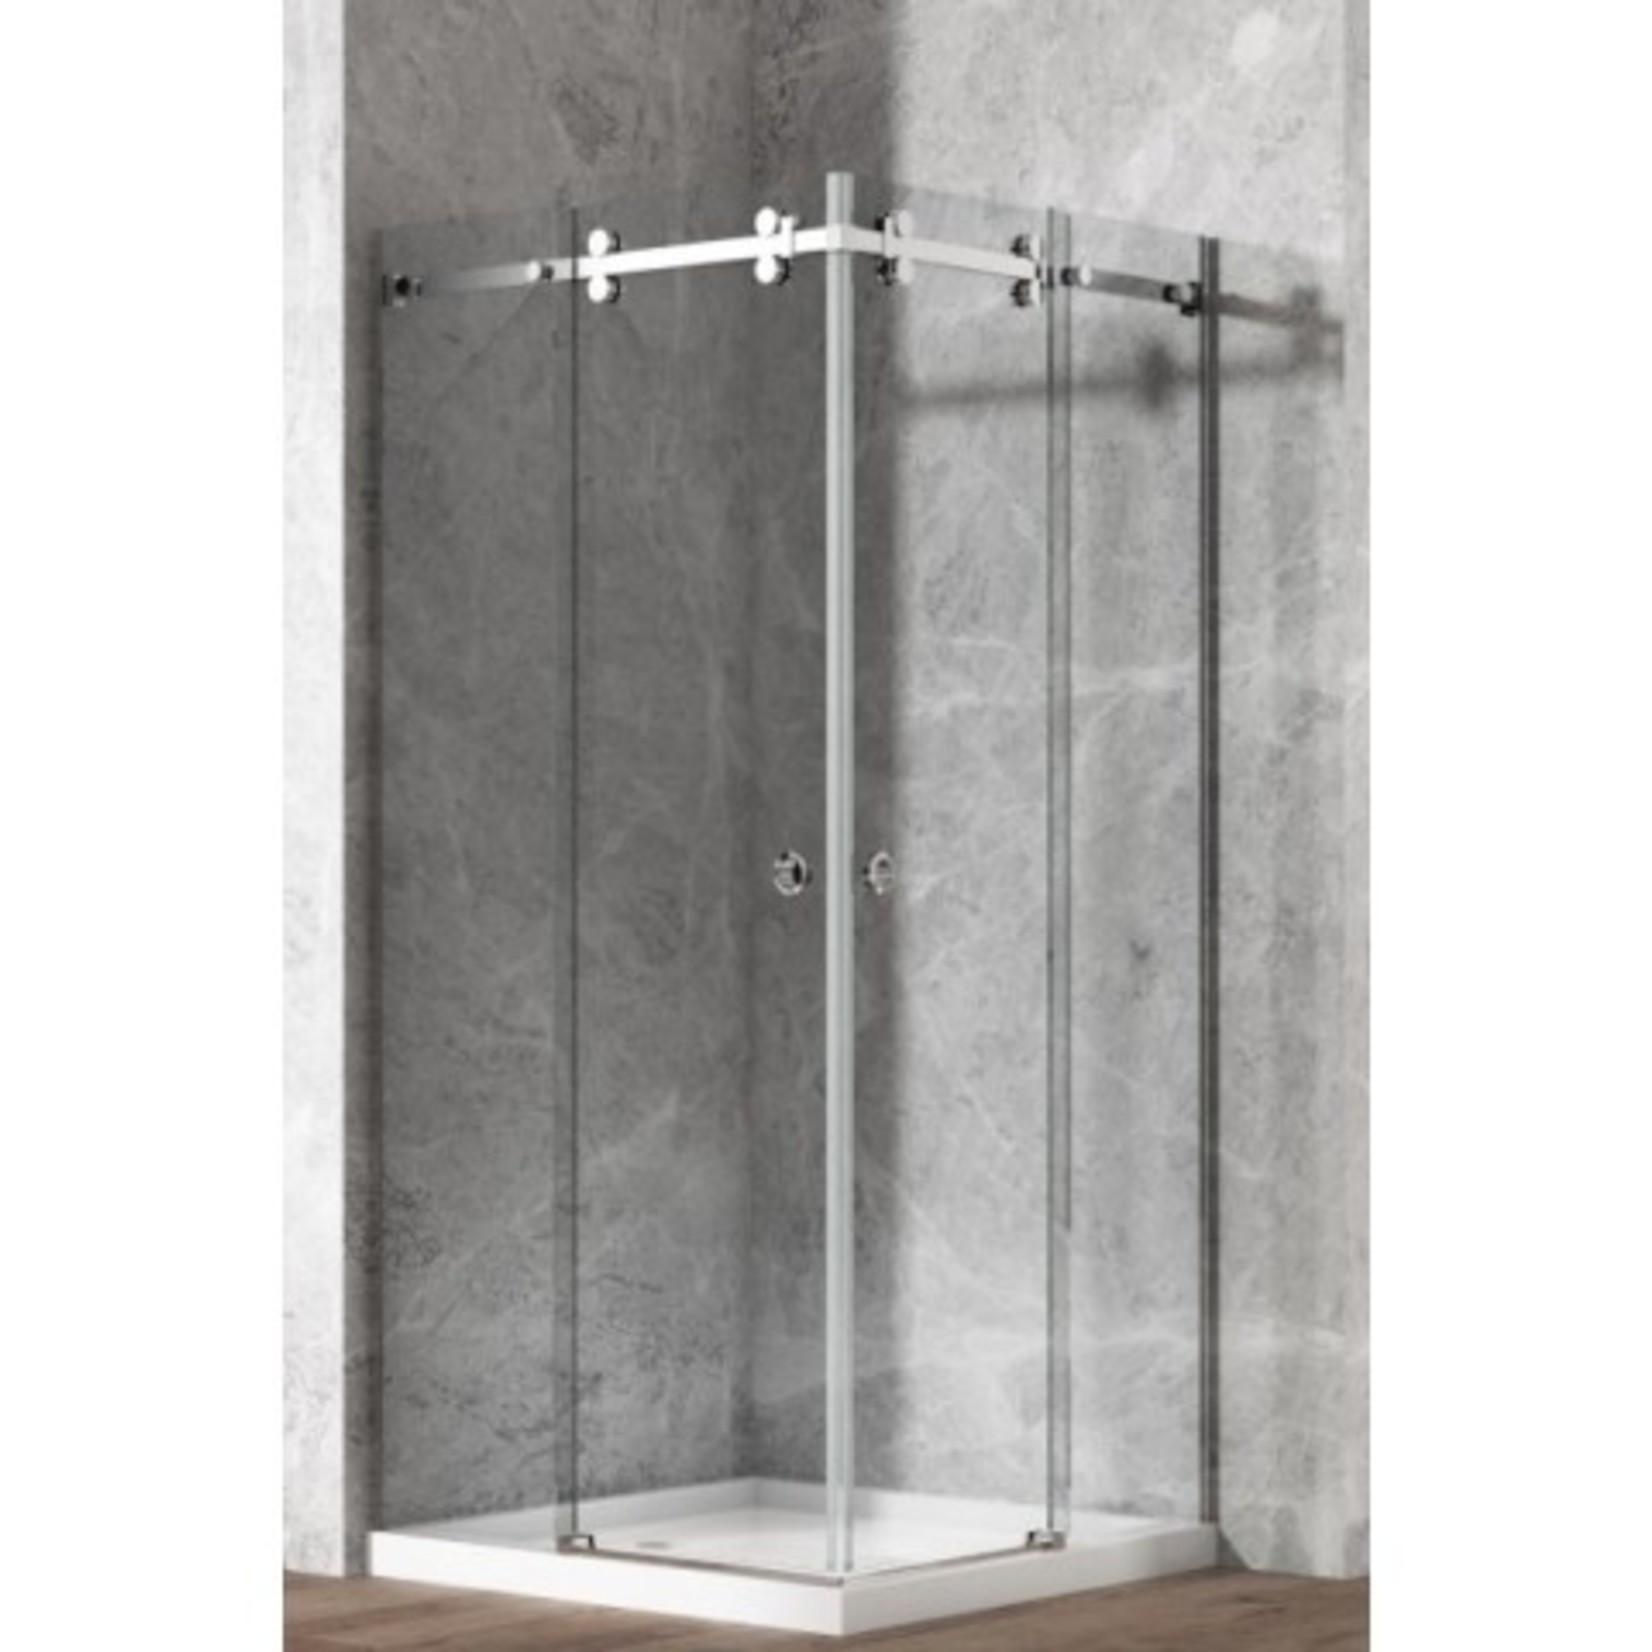 Ensemble de douche en coin  chrome 10mm 40'' x 40'' Lygie